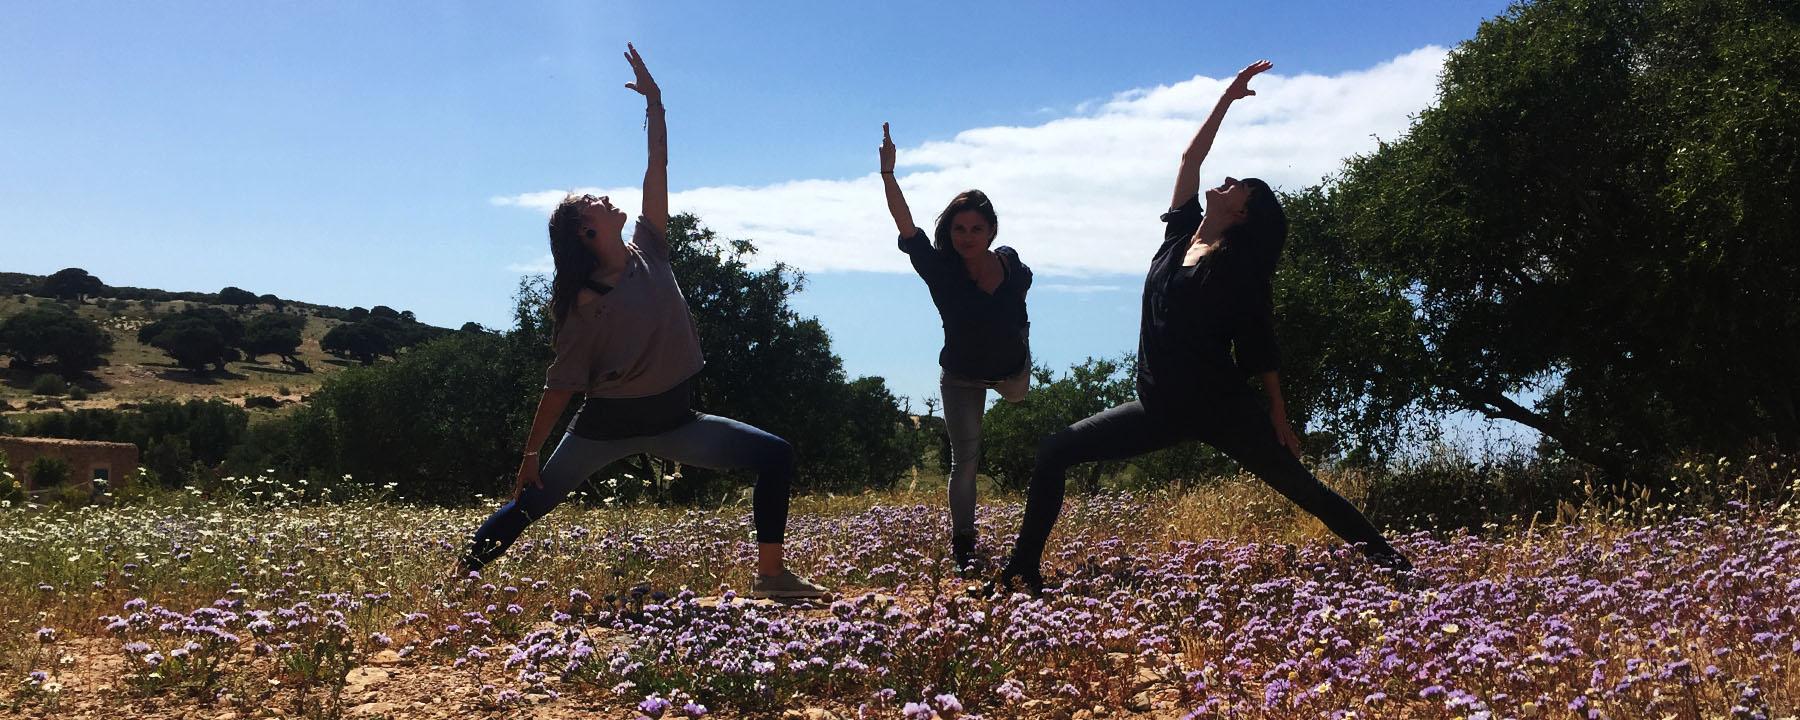 atlantic-coast-beach-yoga-retreat_source-nosade